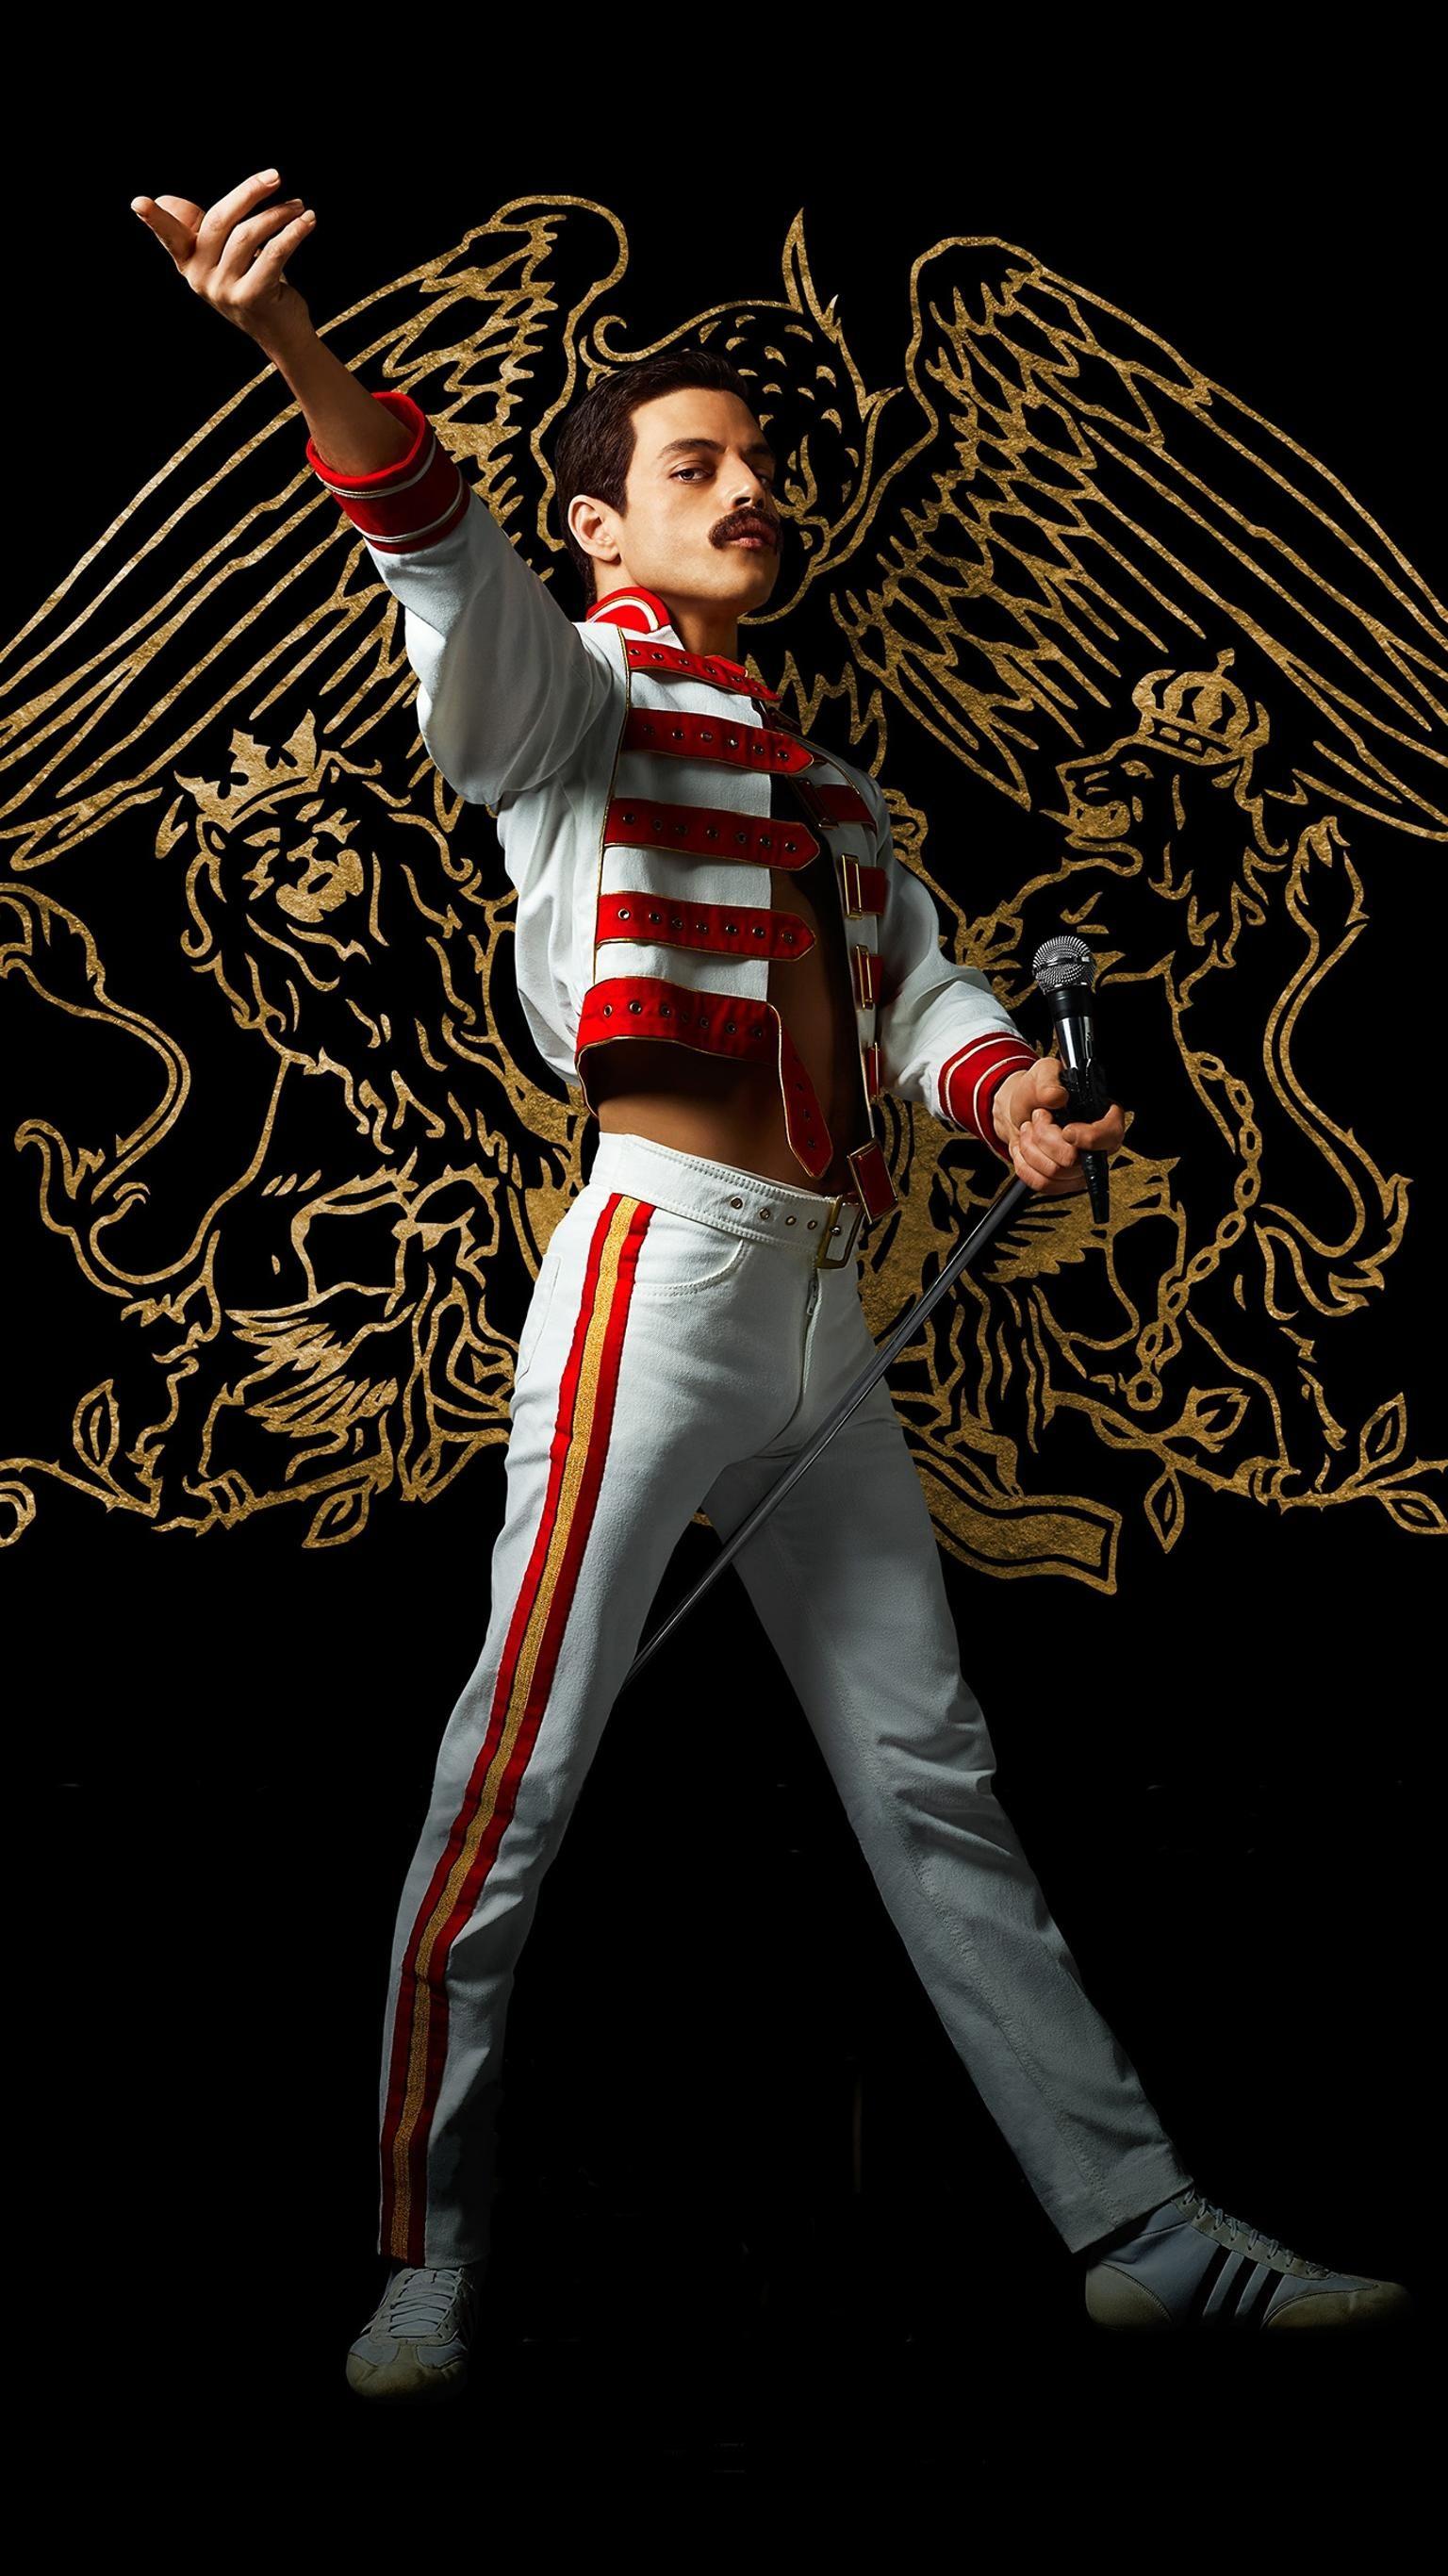 Bohemian Rhapsody 2018 Phone Wallpaper Moviemania Bohemian Rhapsody Queen Freddie Mercury Queen Band